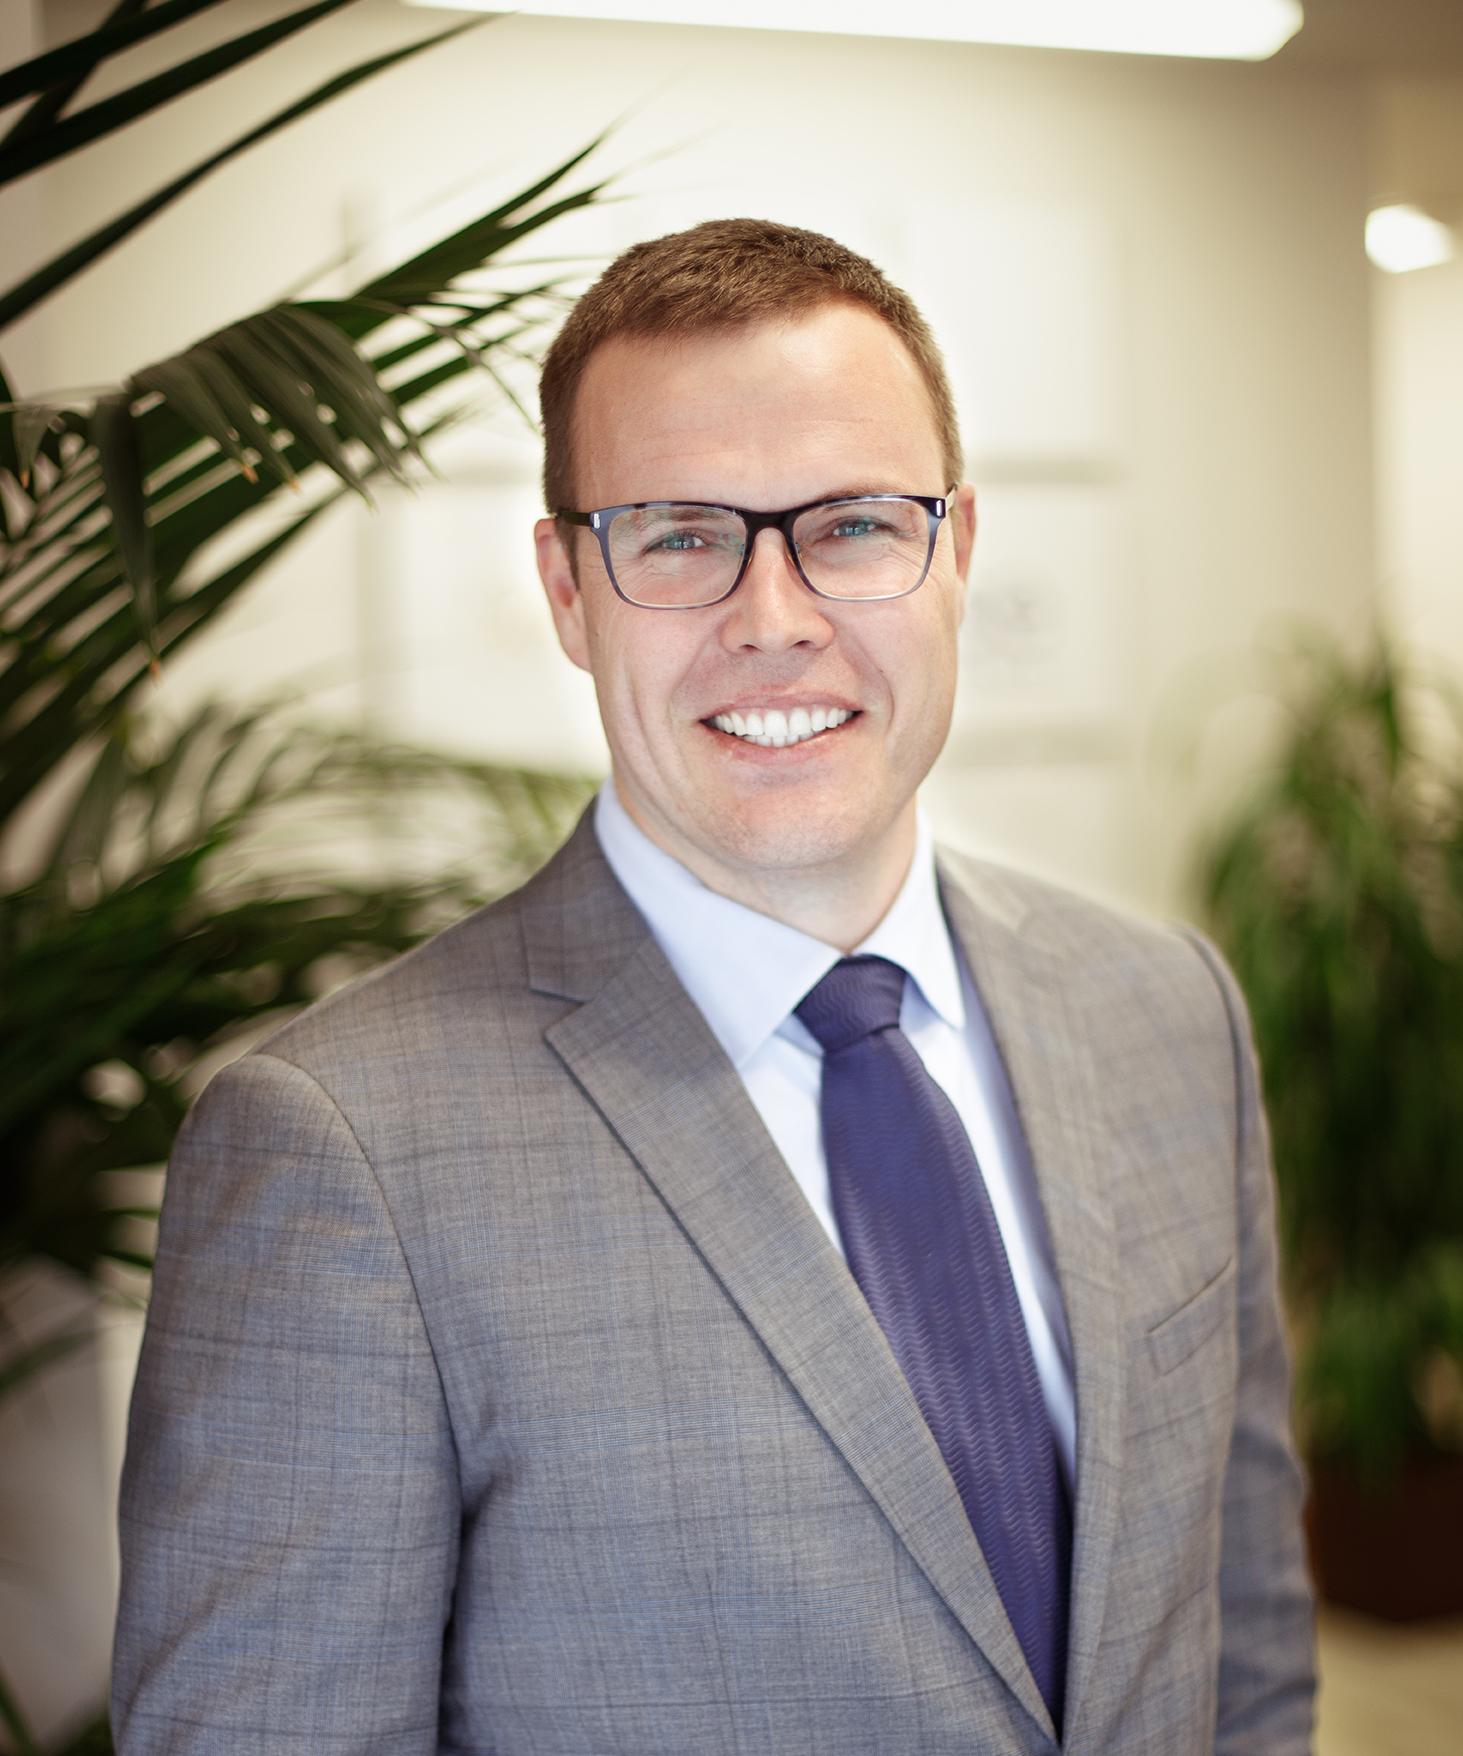 Ambrose Plaister, CEO